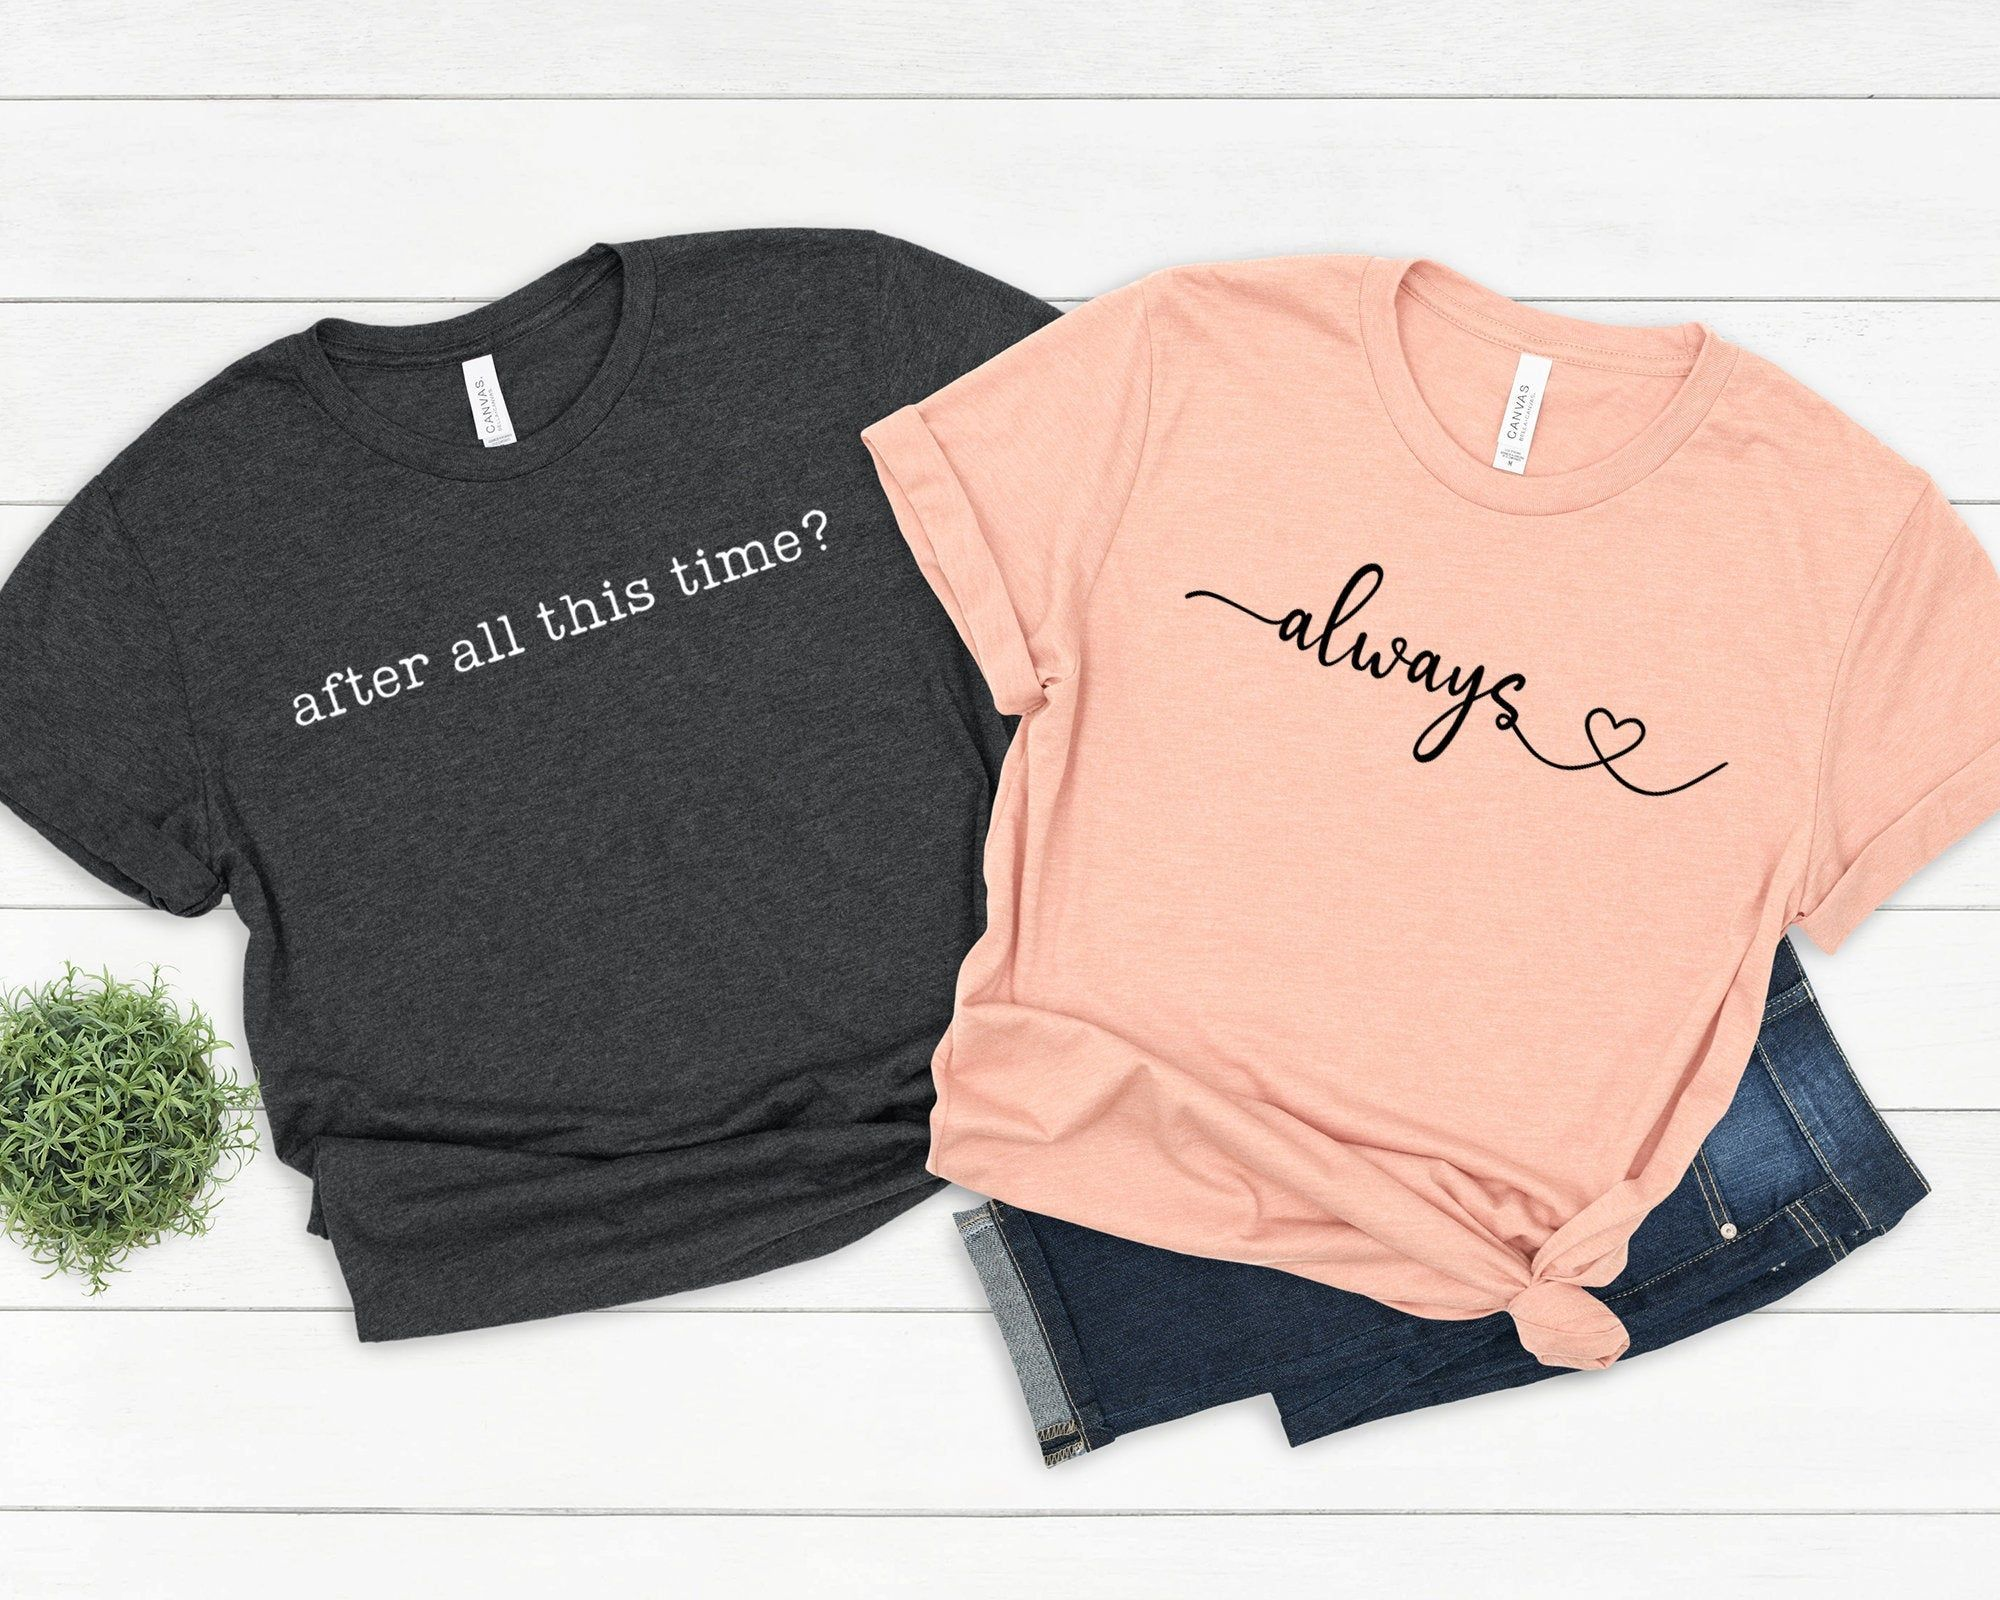 Couple Shirts, After All This Time Always Shirt, Severus Snape Always Shirt, Pottery Shirt, Hubby Wifey Shirts, Boyfriend Girilfriend Tshirt